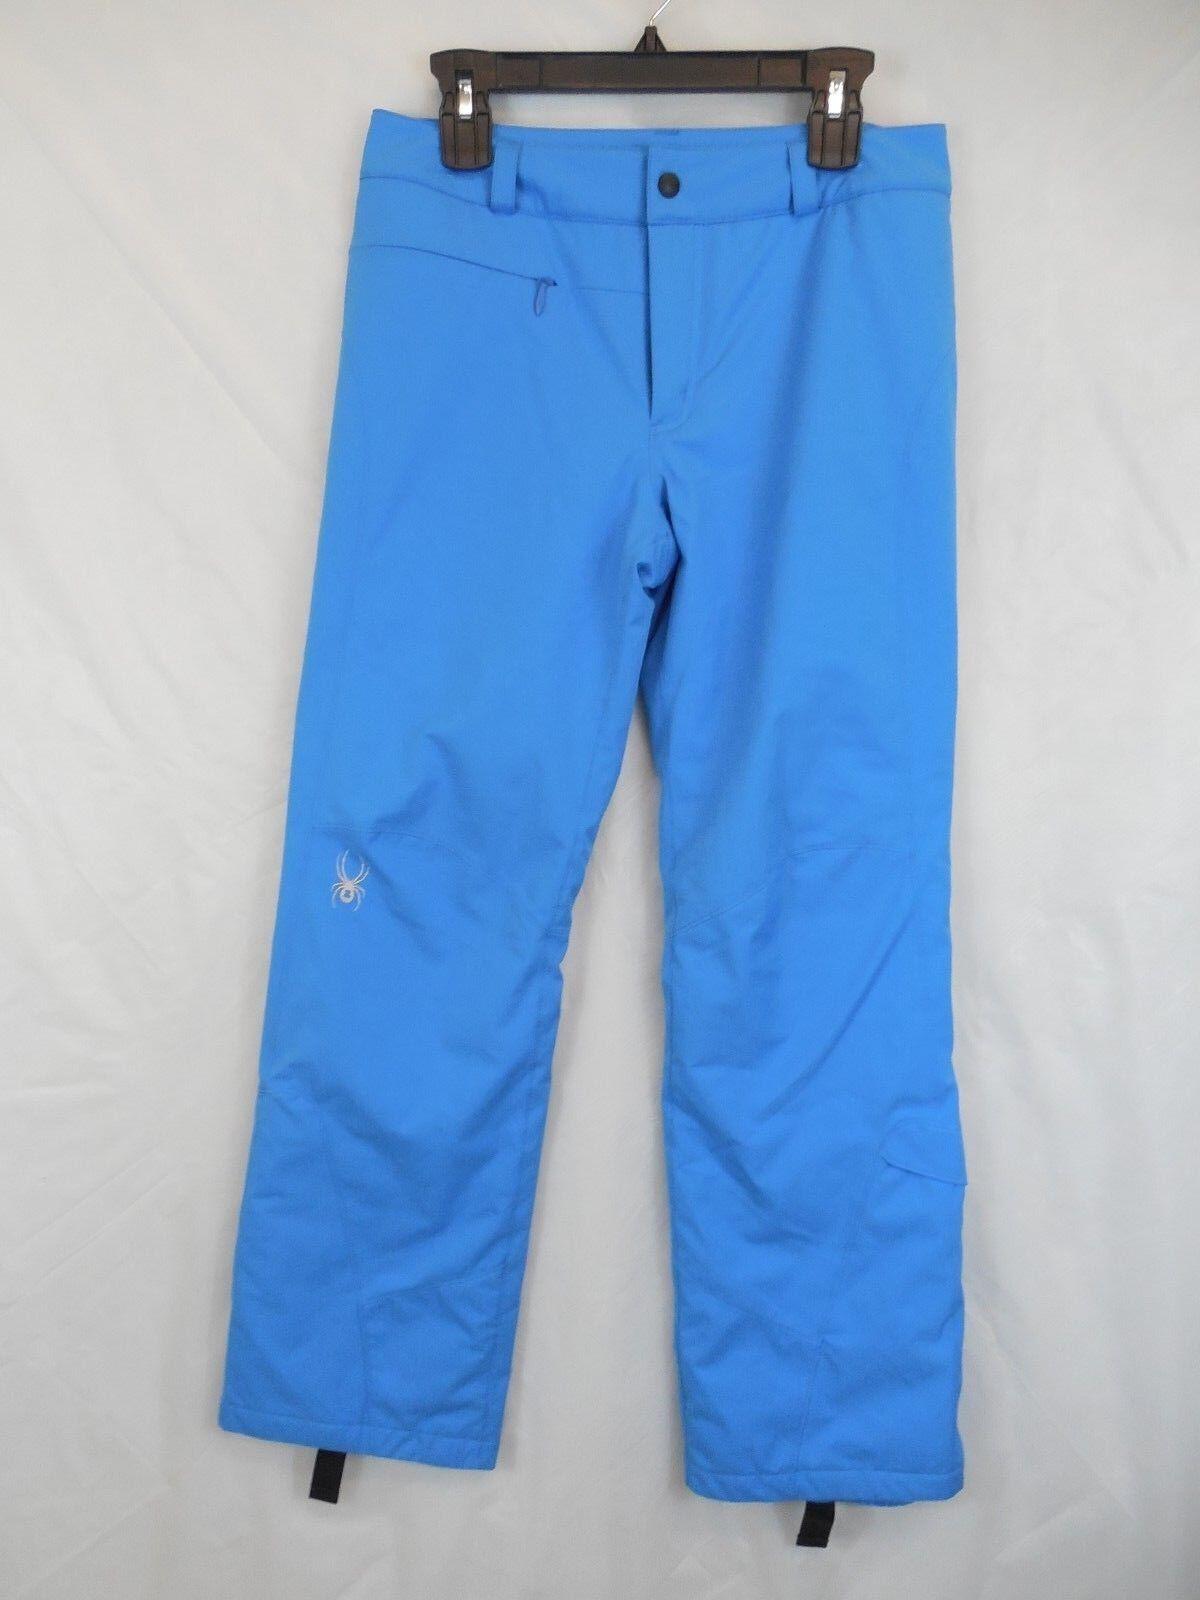 Womens 8 Spyder bluee Ski Snowboard Winner Tailored Pants Spylon 10k